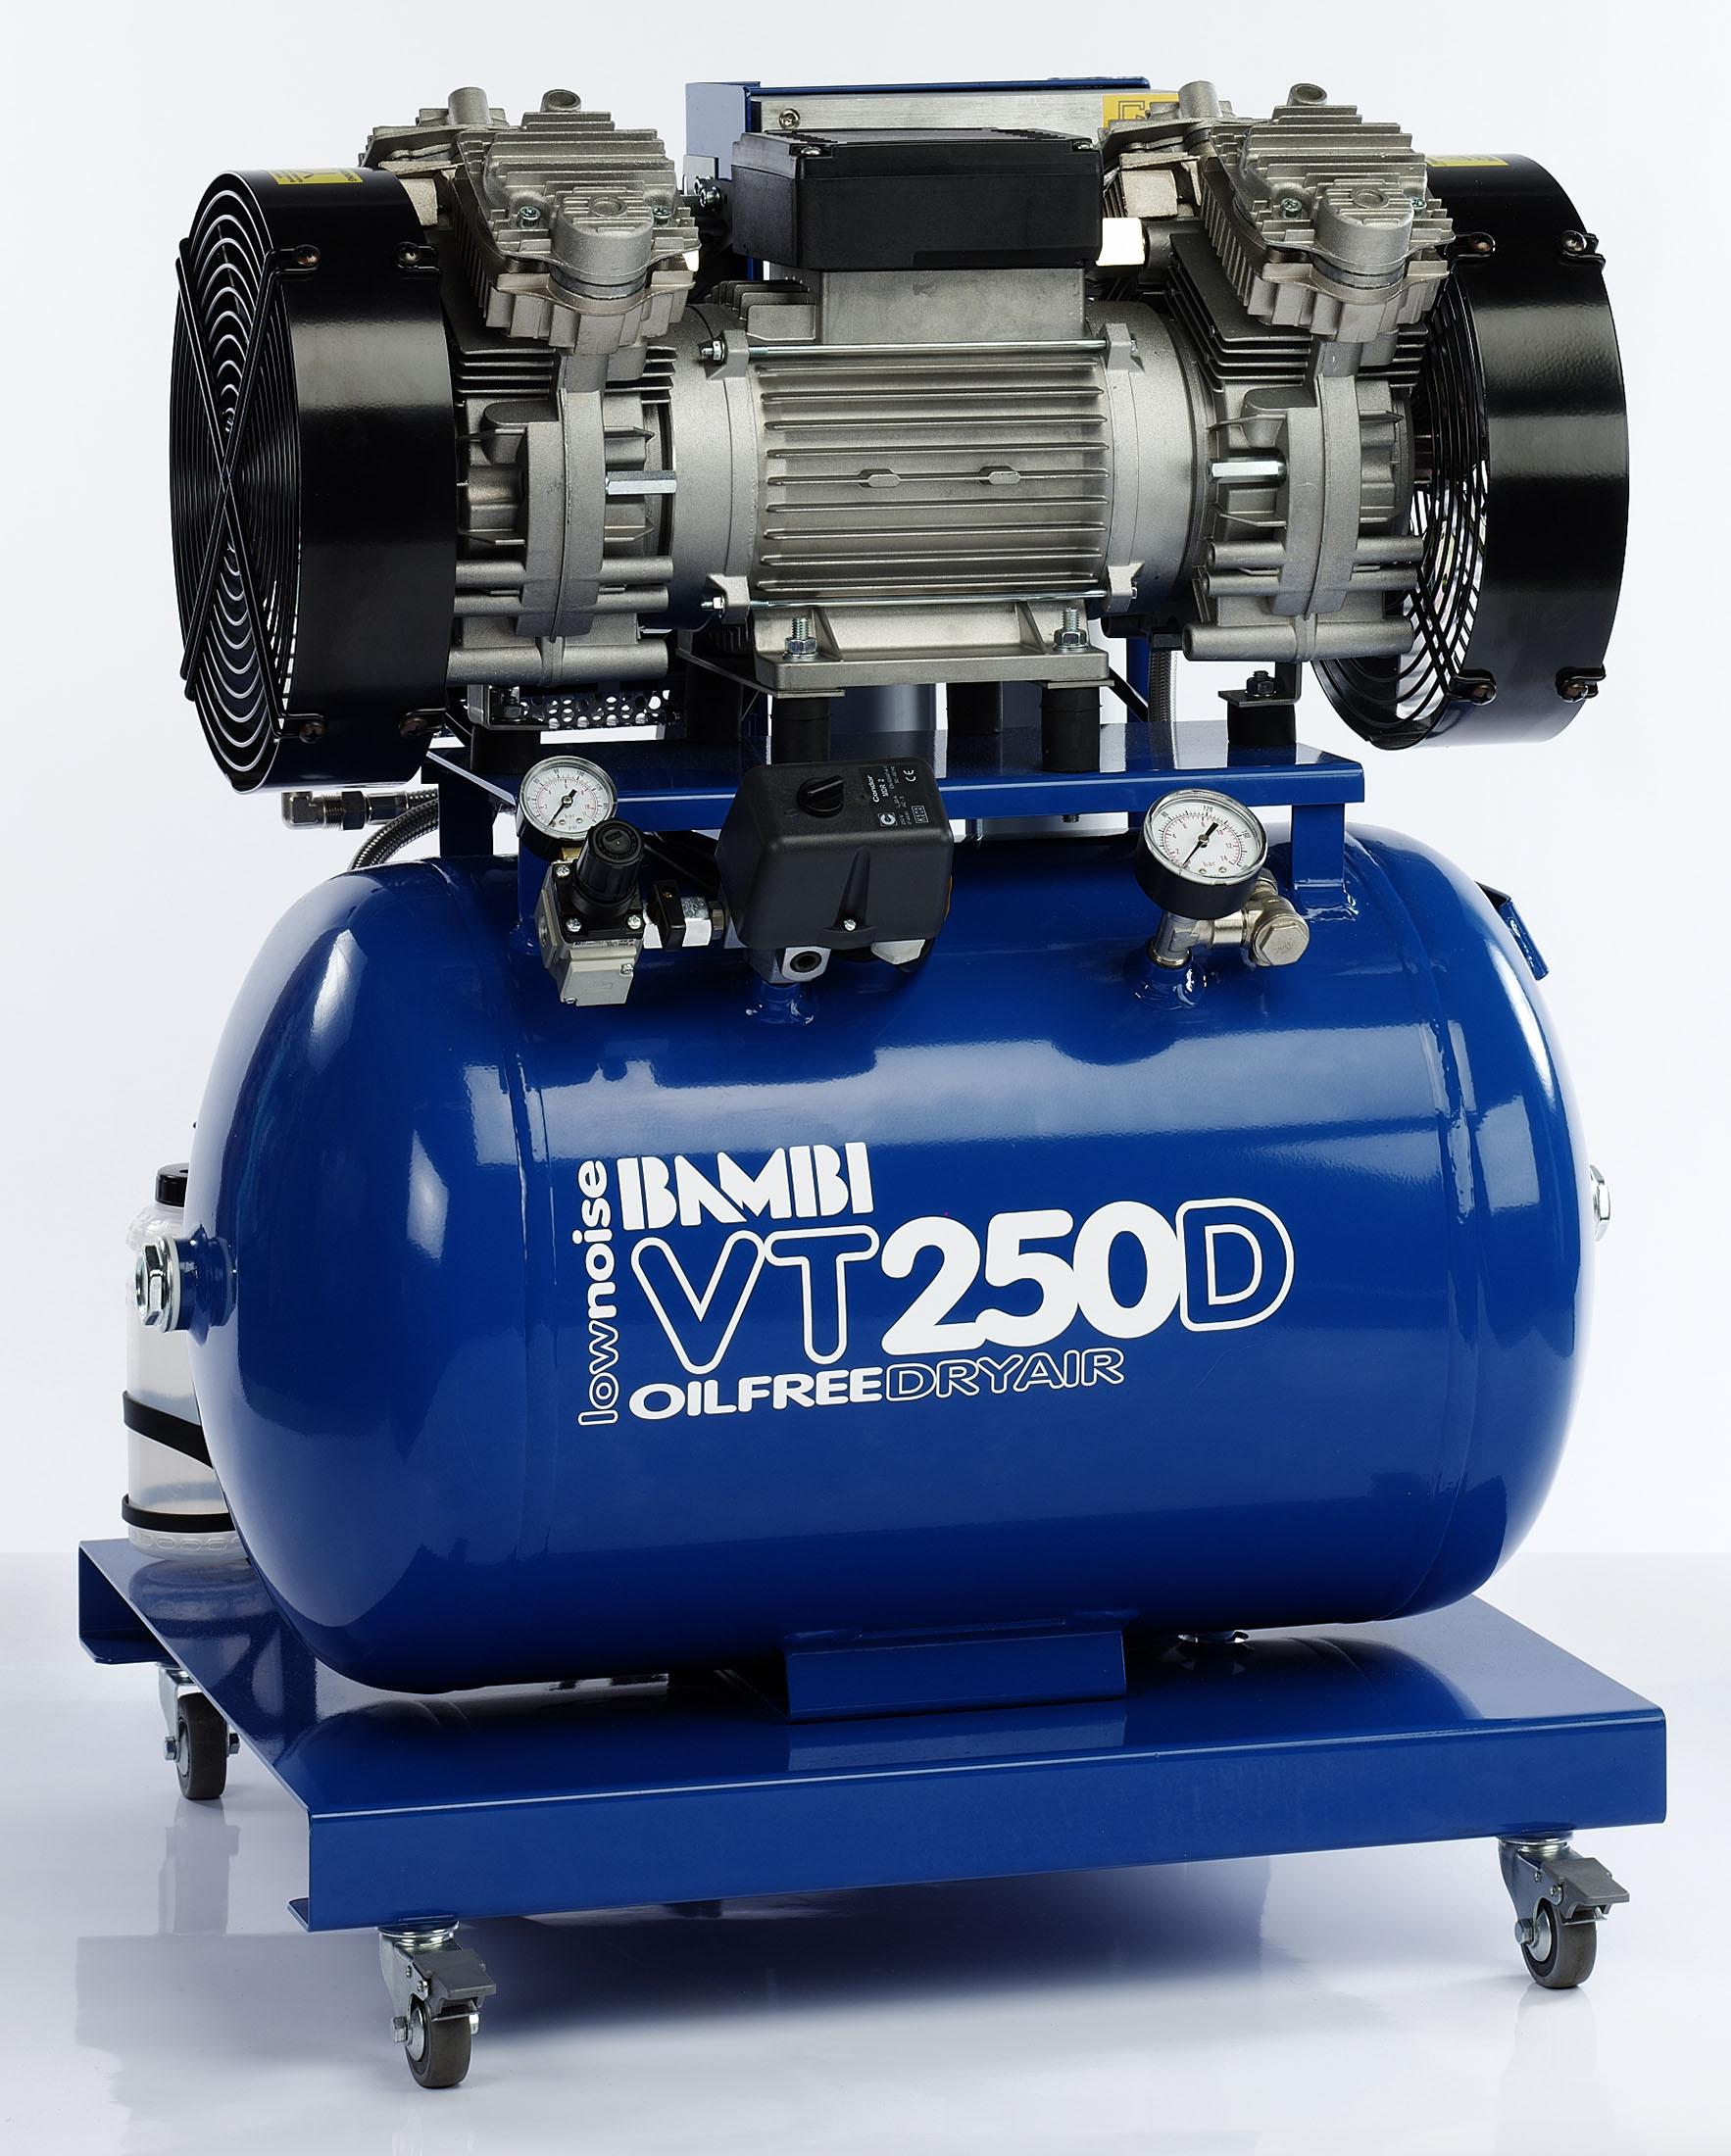 Midlands UK supplier of Bambi VT250D air compressor